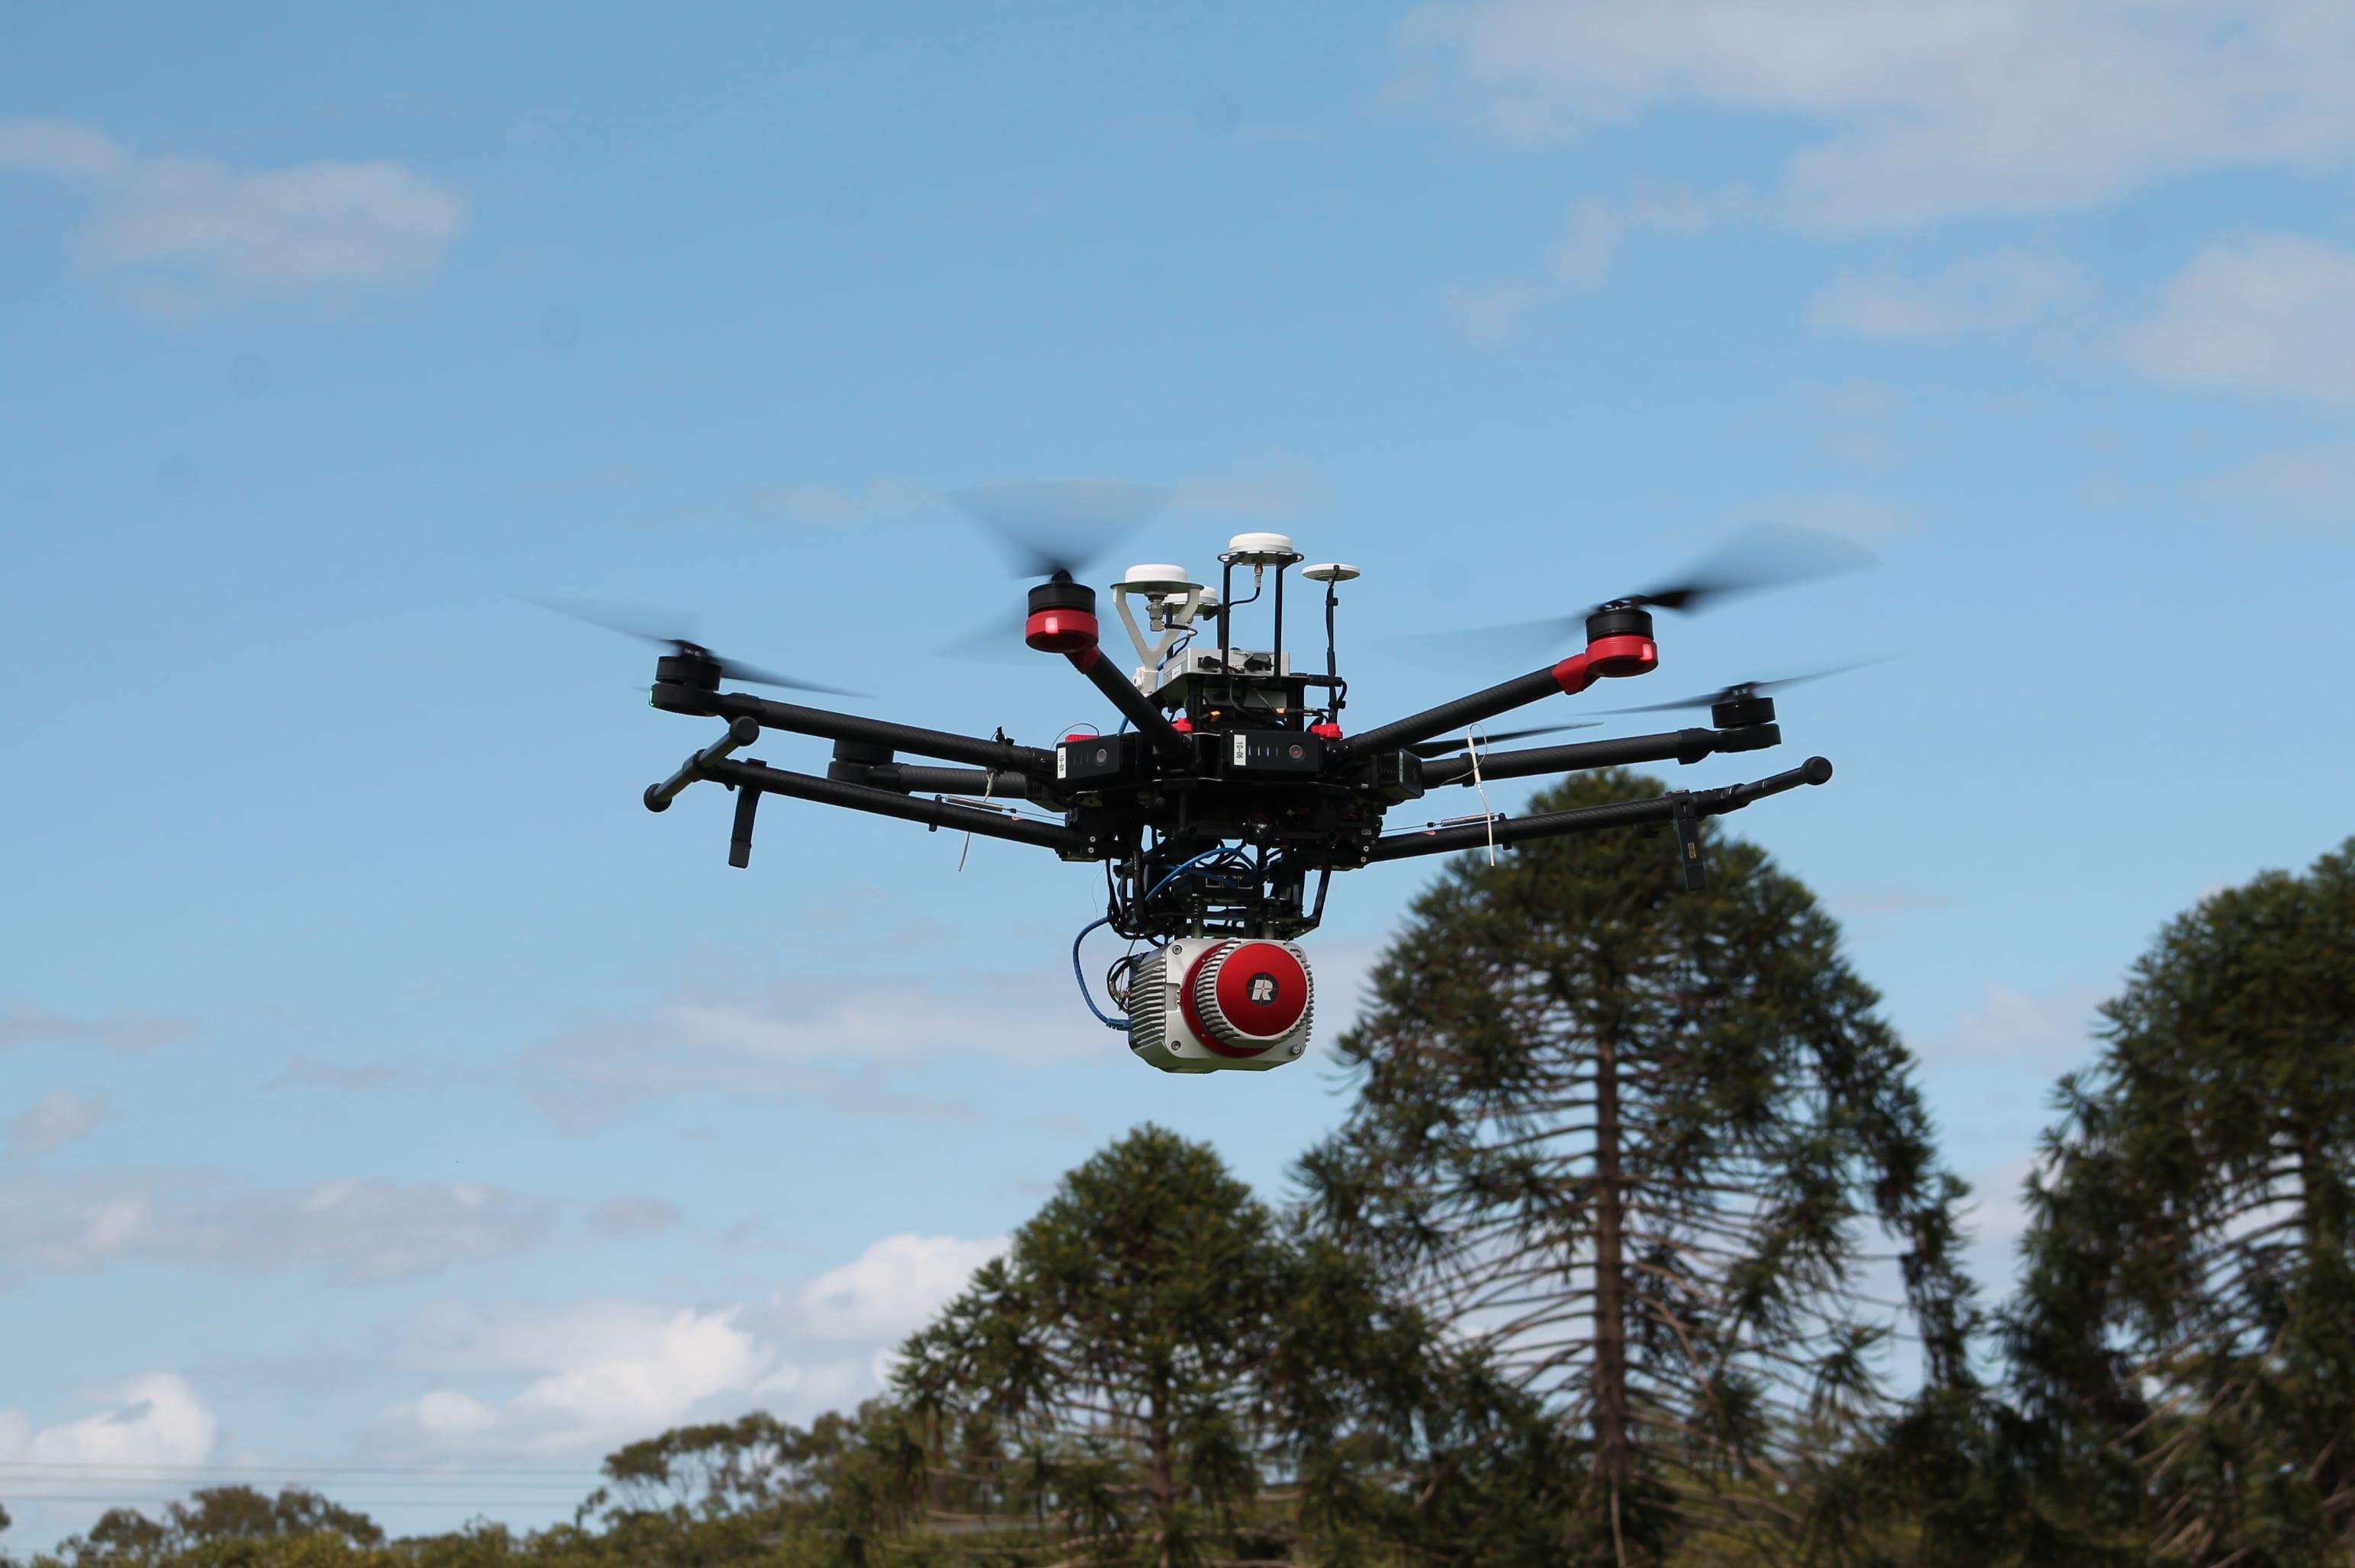 Multi-rotor UAV with LiDAR